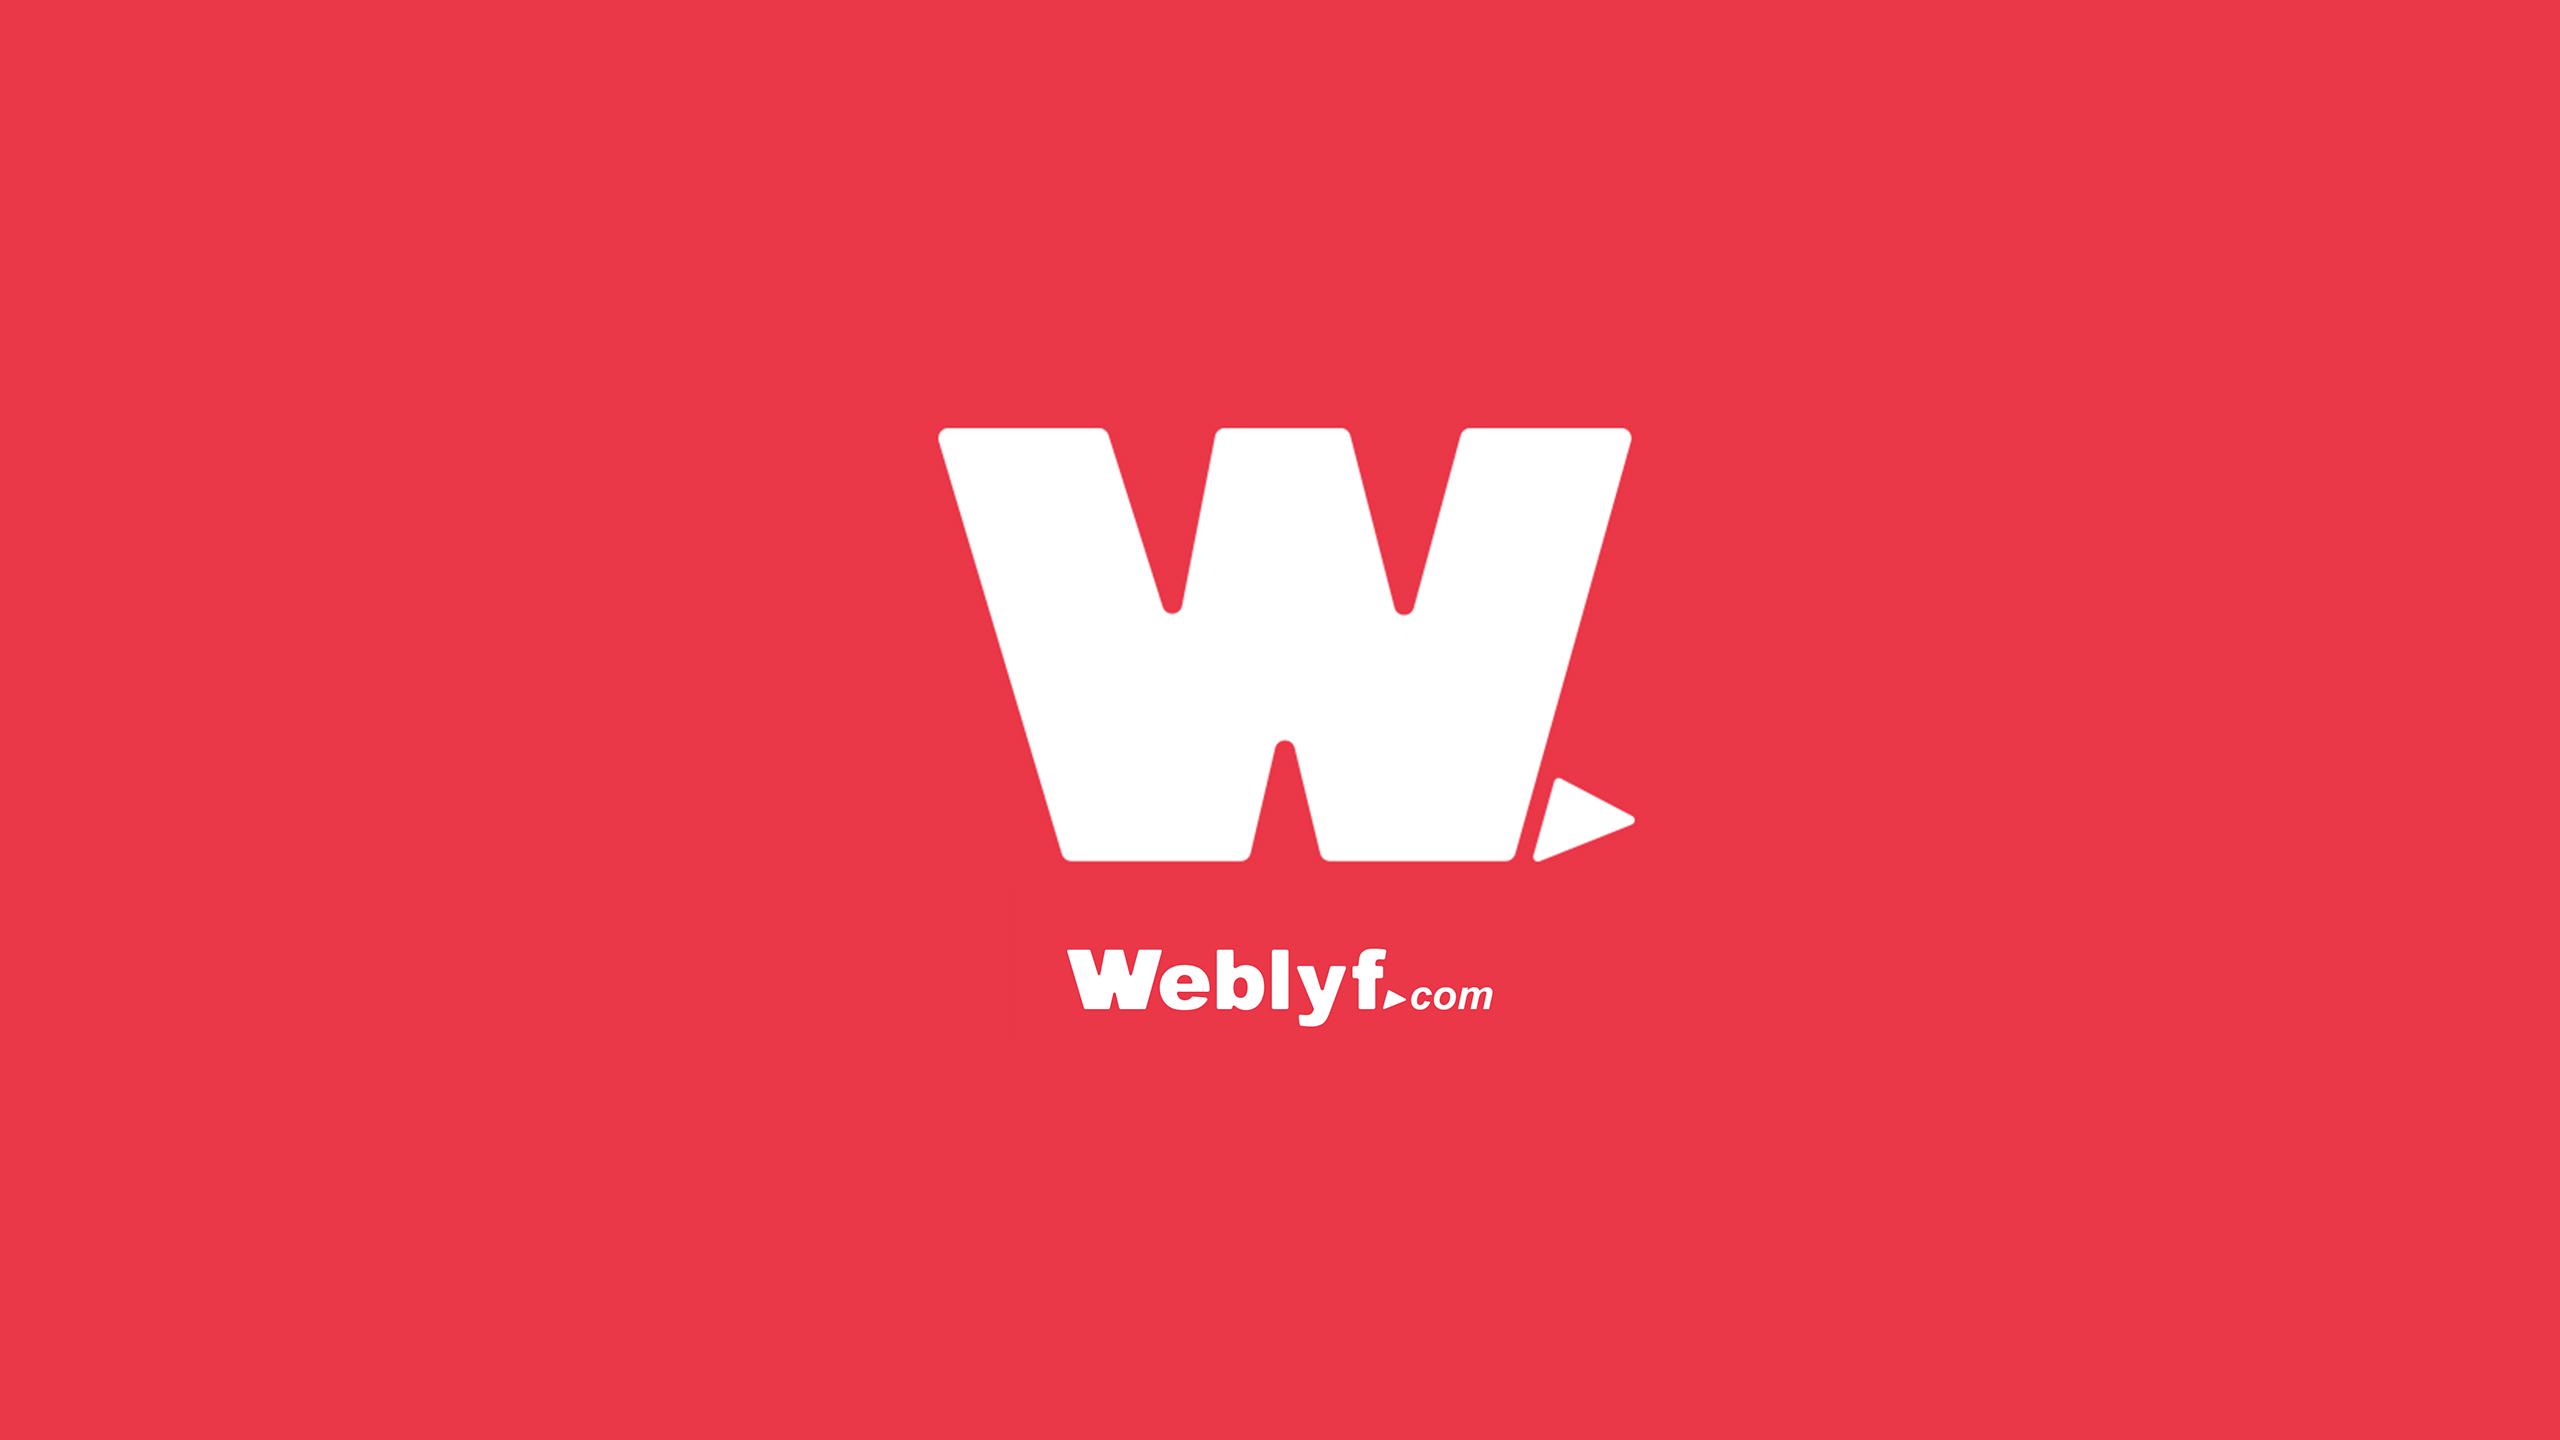 weblyf cover